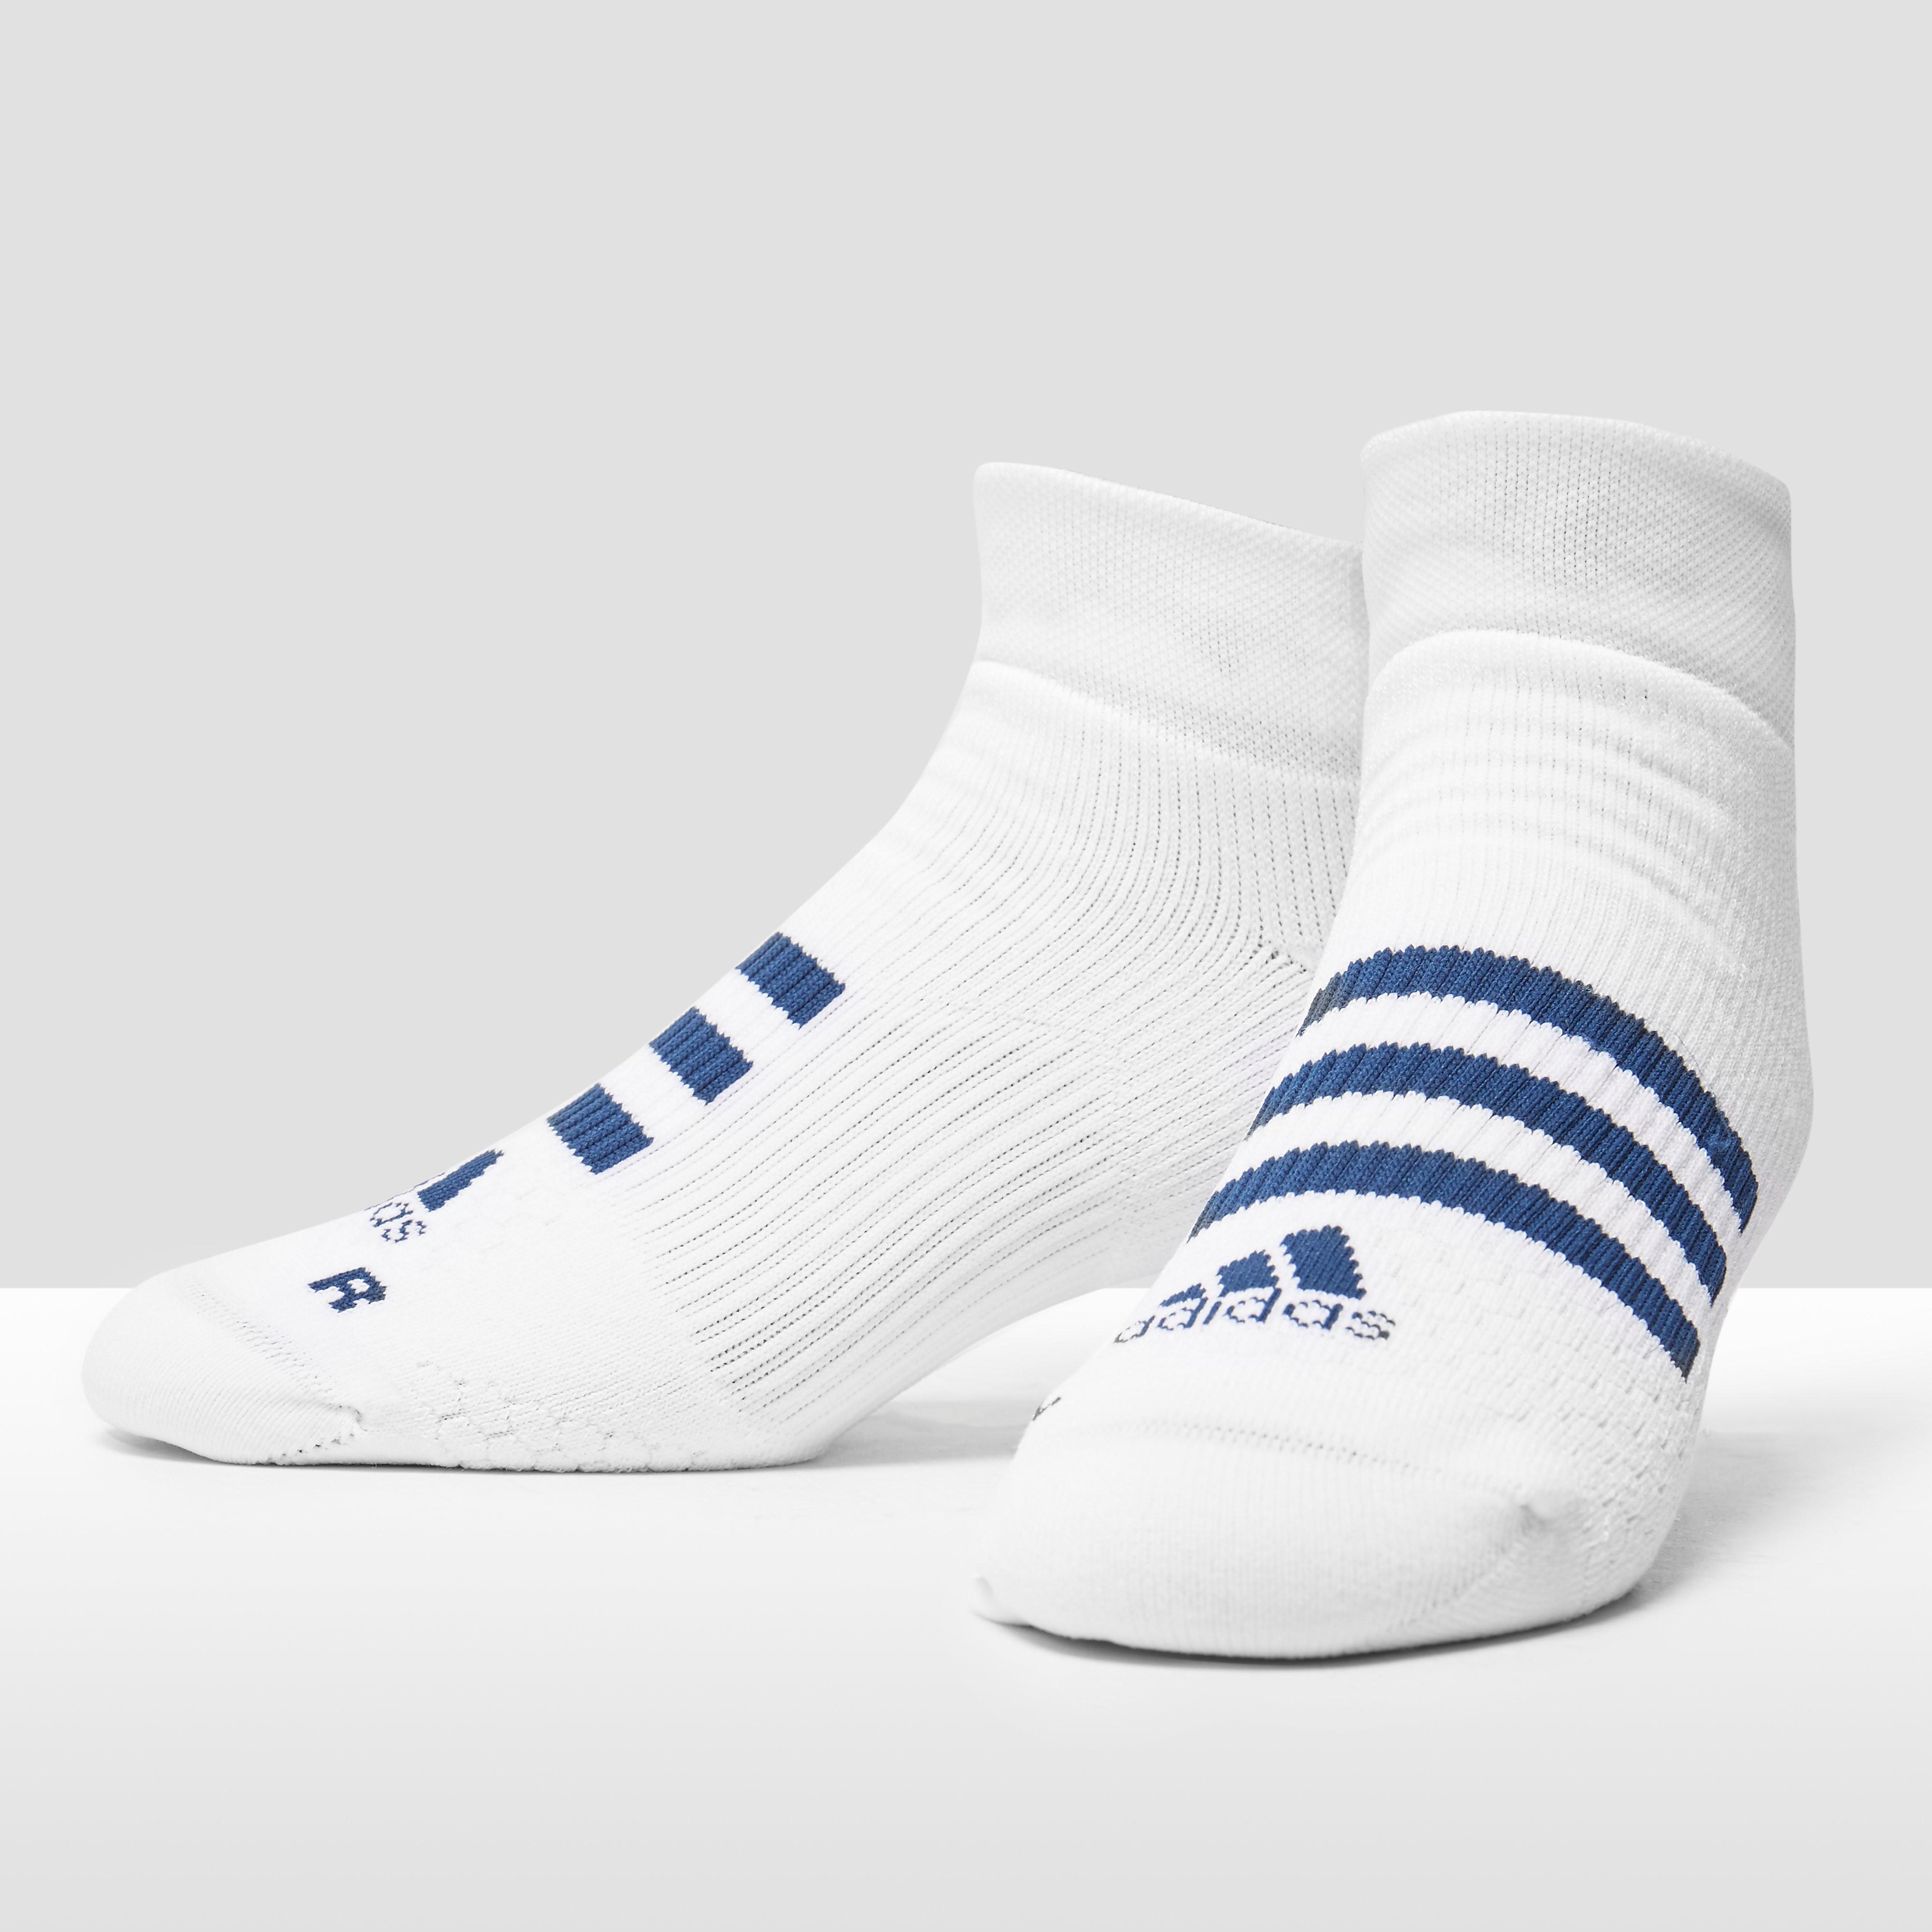 adidas Tennis Liner Tennis Socks